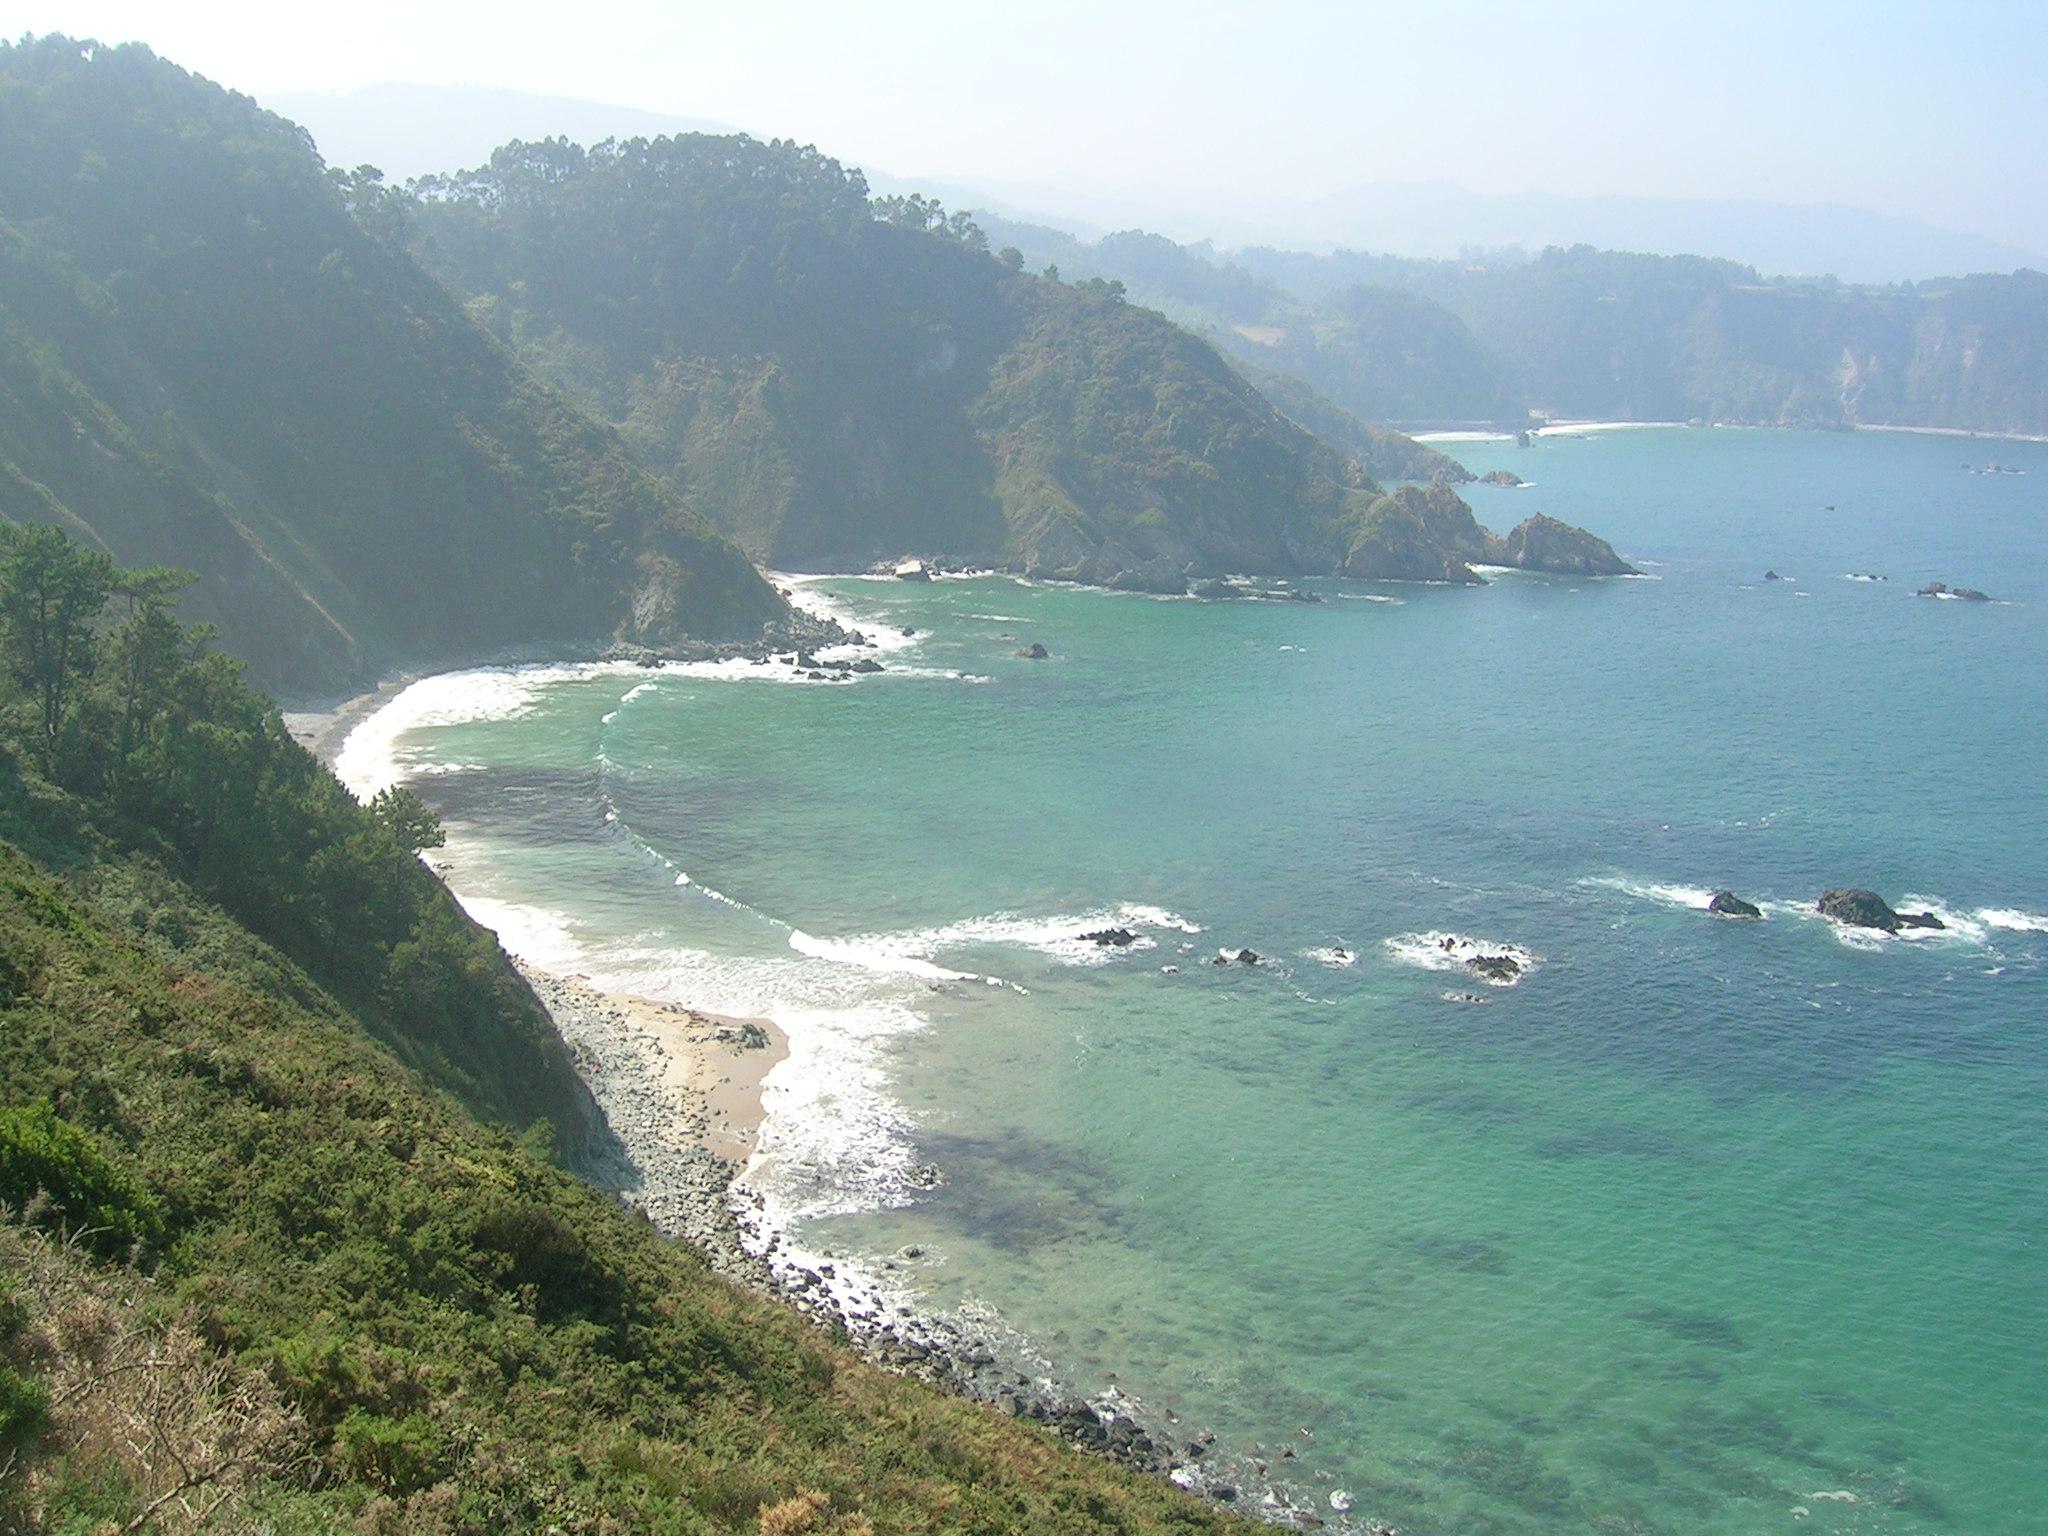 Playa Cazonera